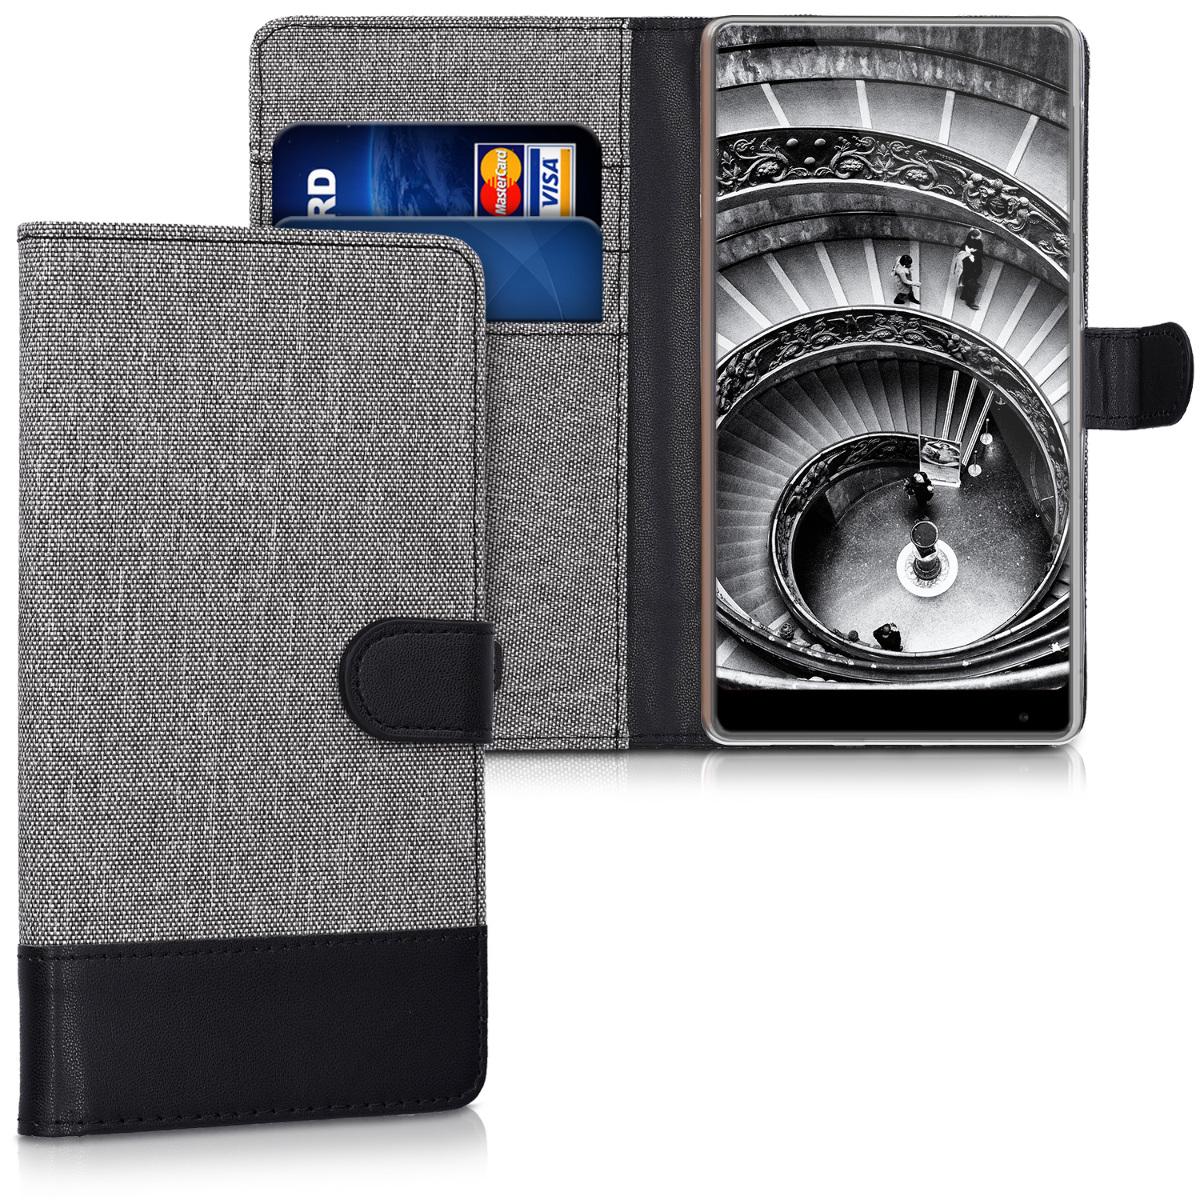 KW Θήκη Πορτοφόλι Xiaomi Mi Mix - Συνθετικό δέρμα - Grey / Black (41523.22)